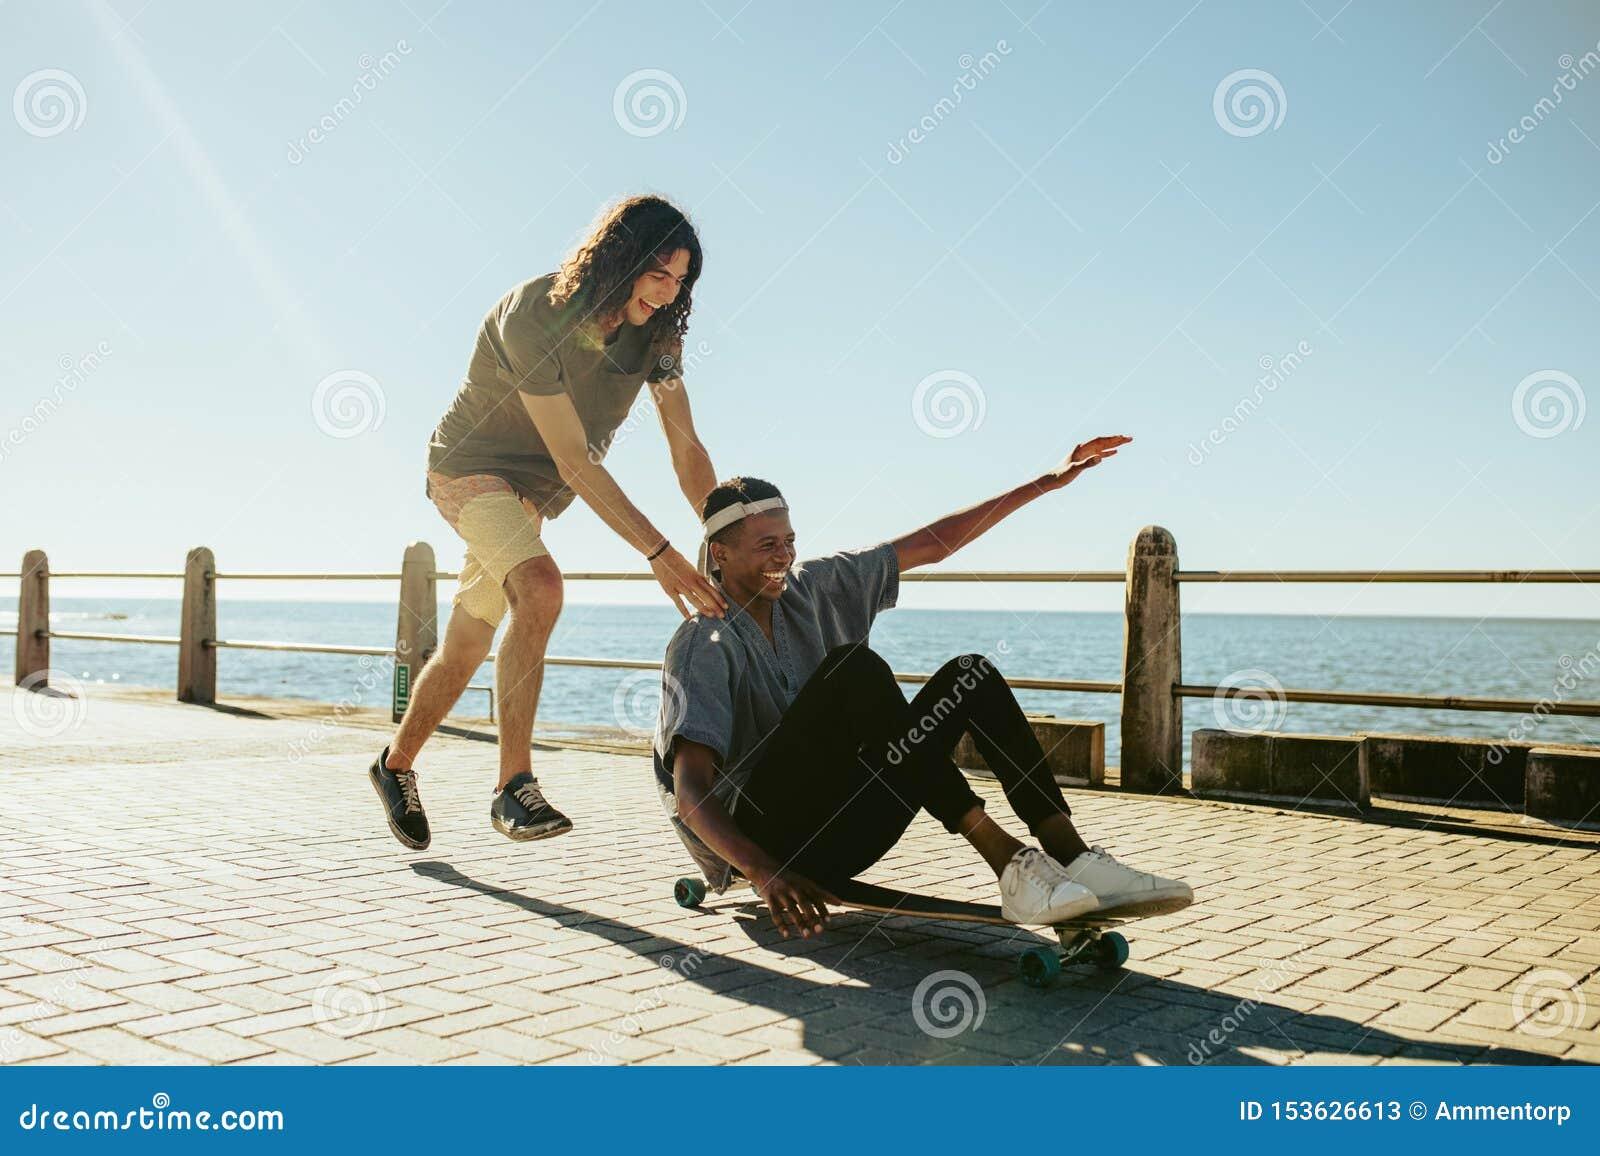 Boys enjoying outdoors on seaside road